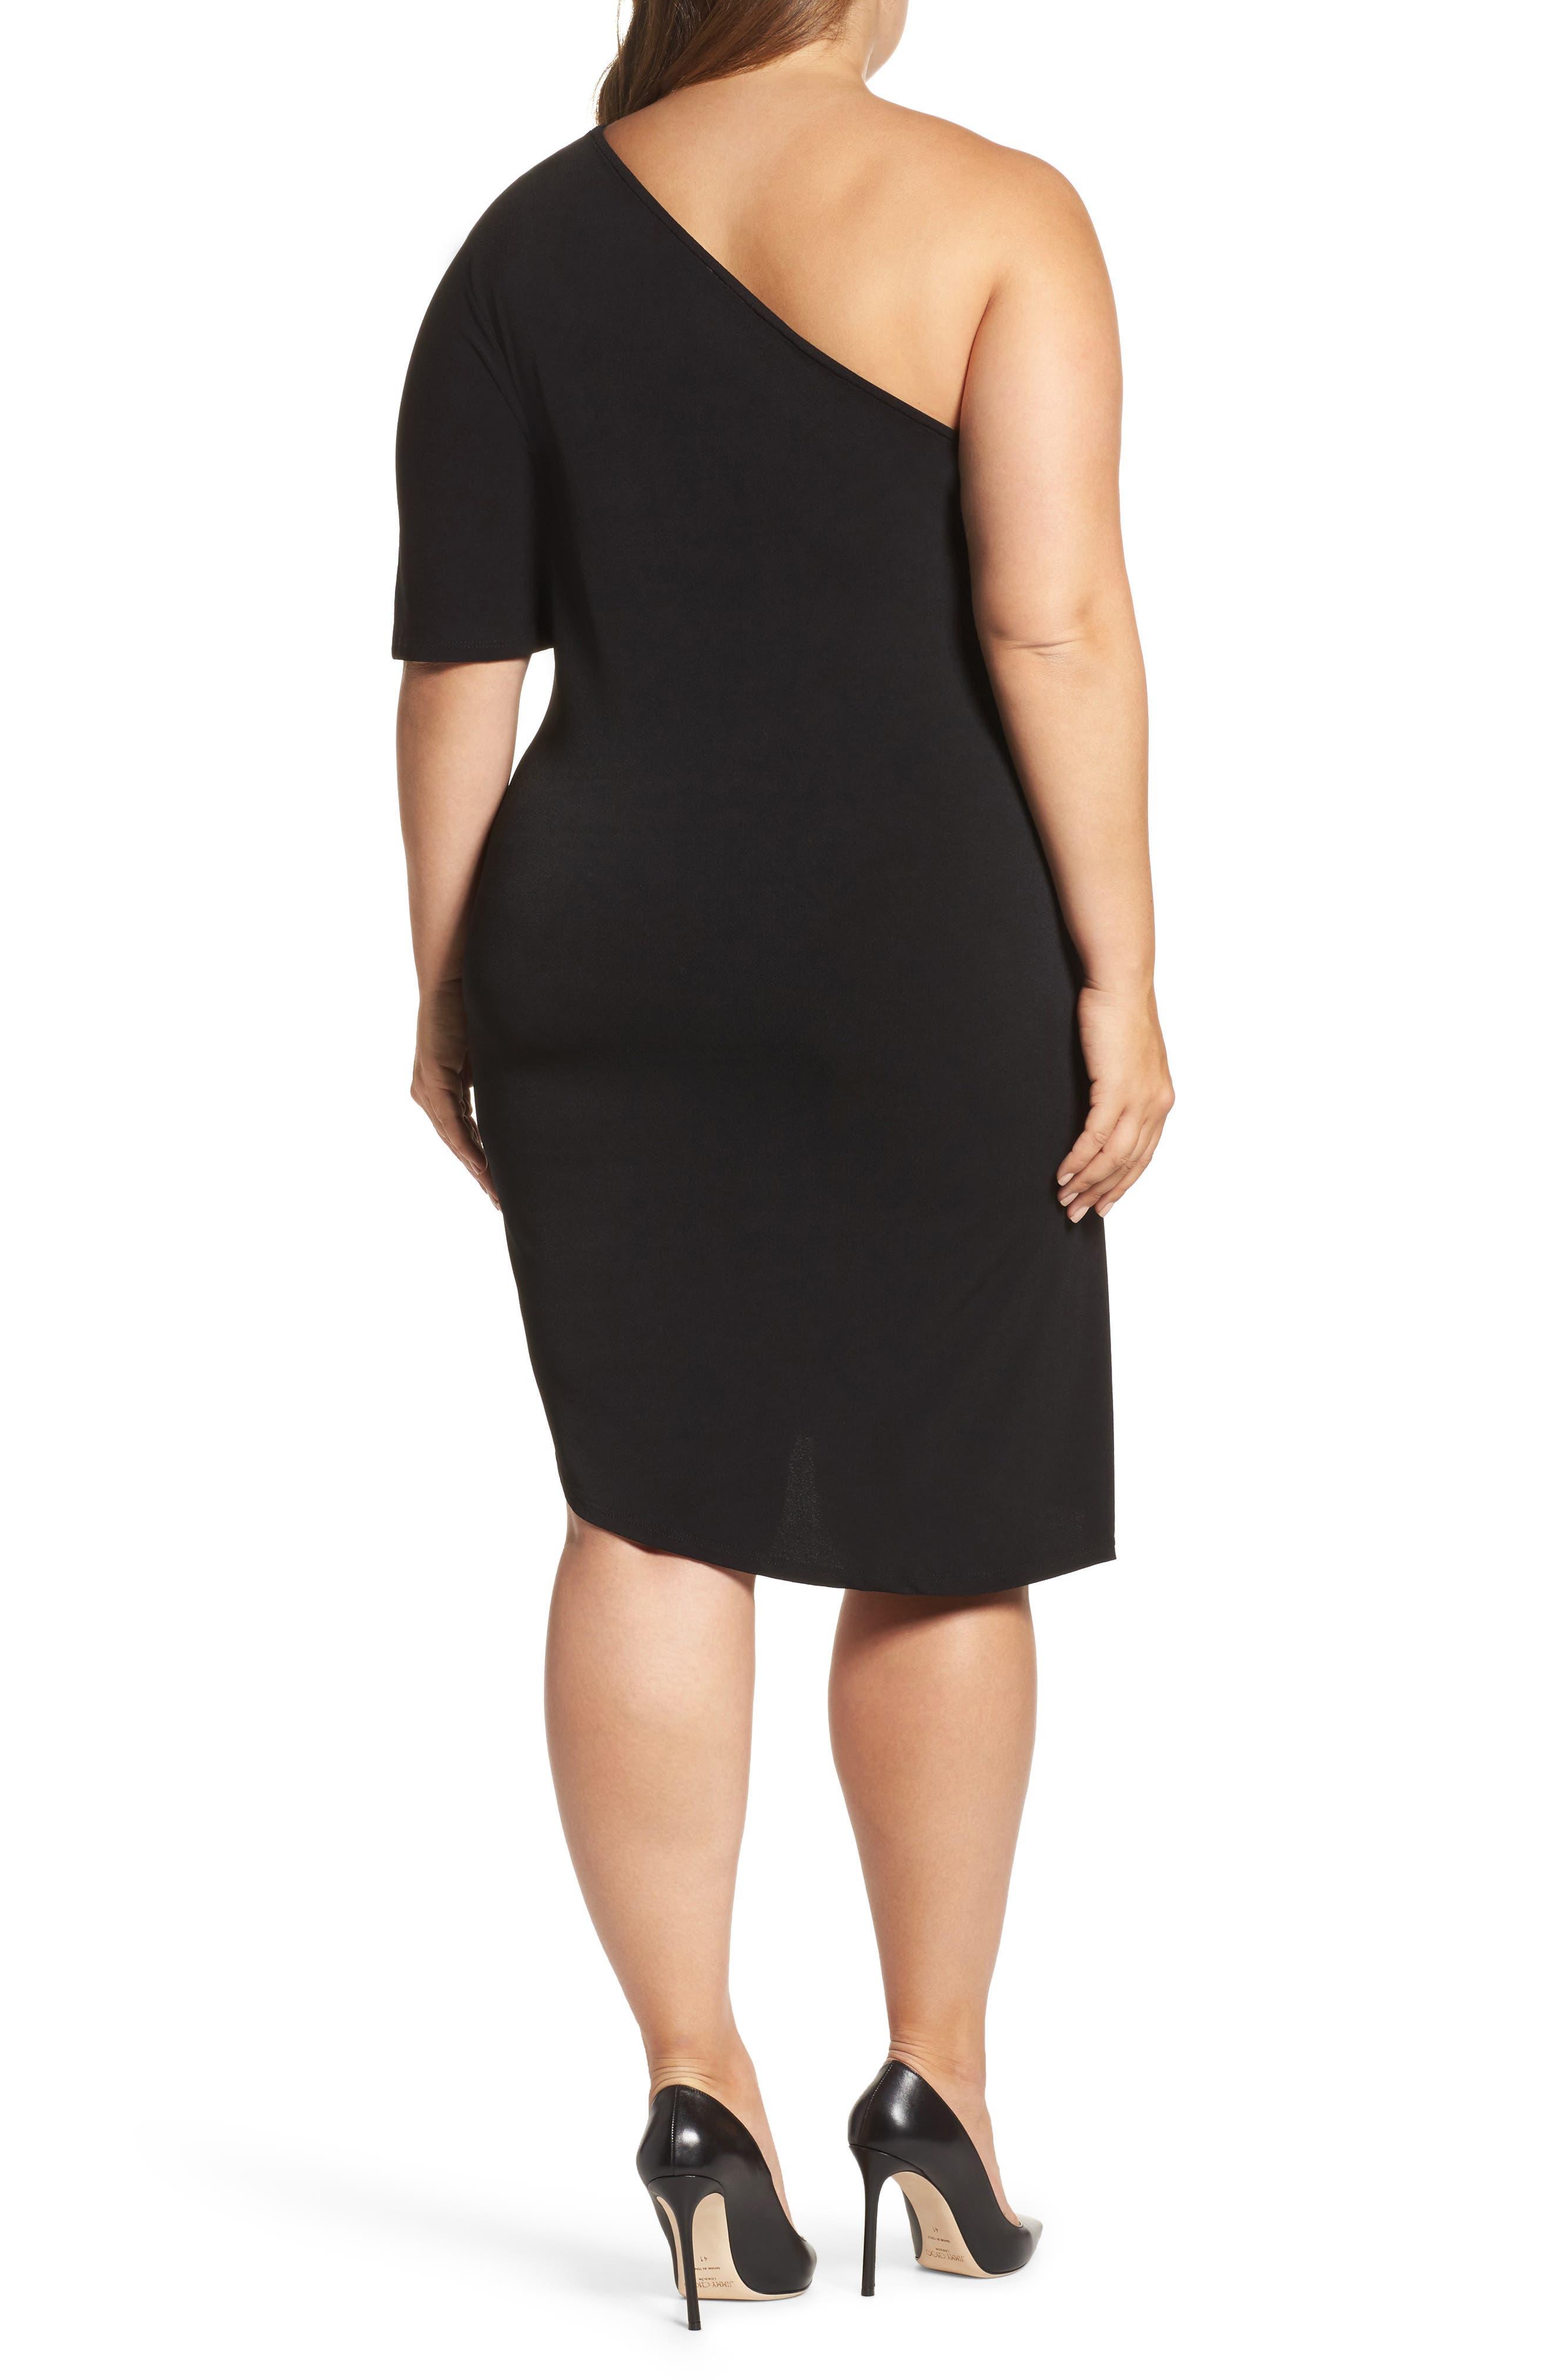 Alternate Image 2  - Leota Christina One-Shoulder Dress (Plus Size)